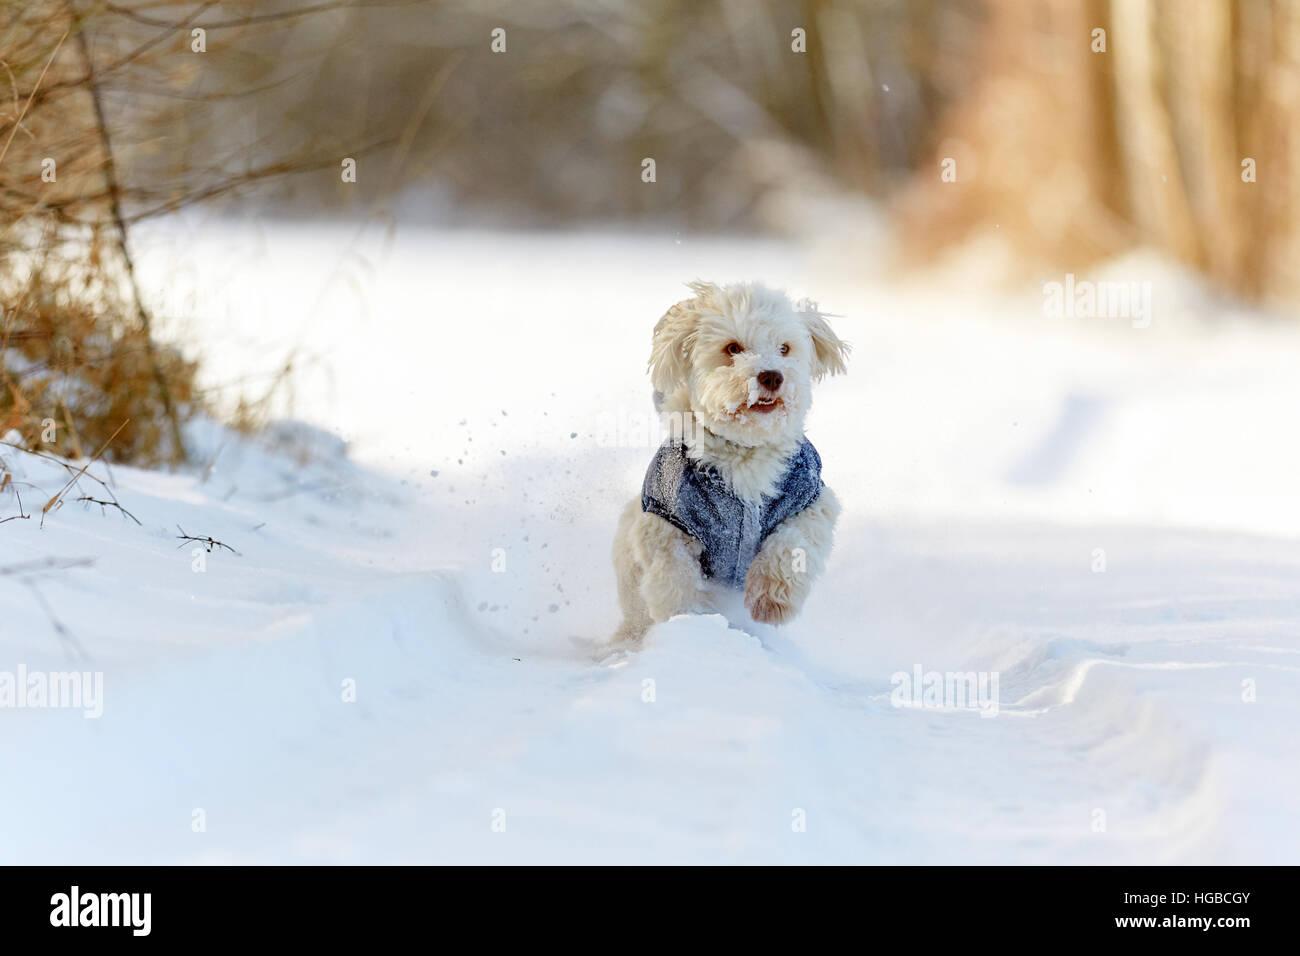 White havanese dog running in snow in winter in the park Stock Photo